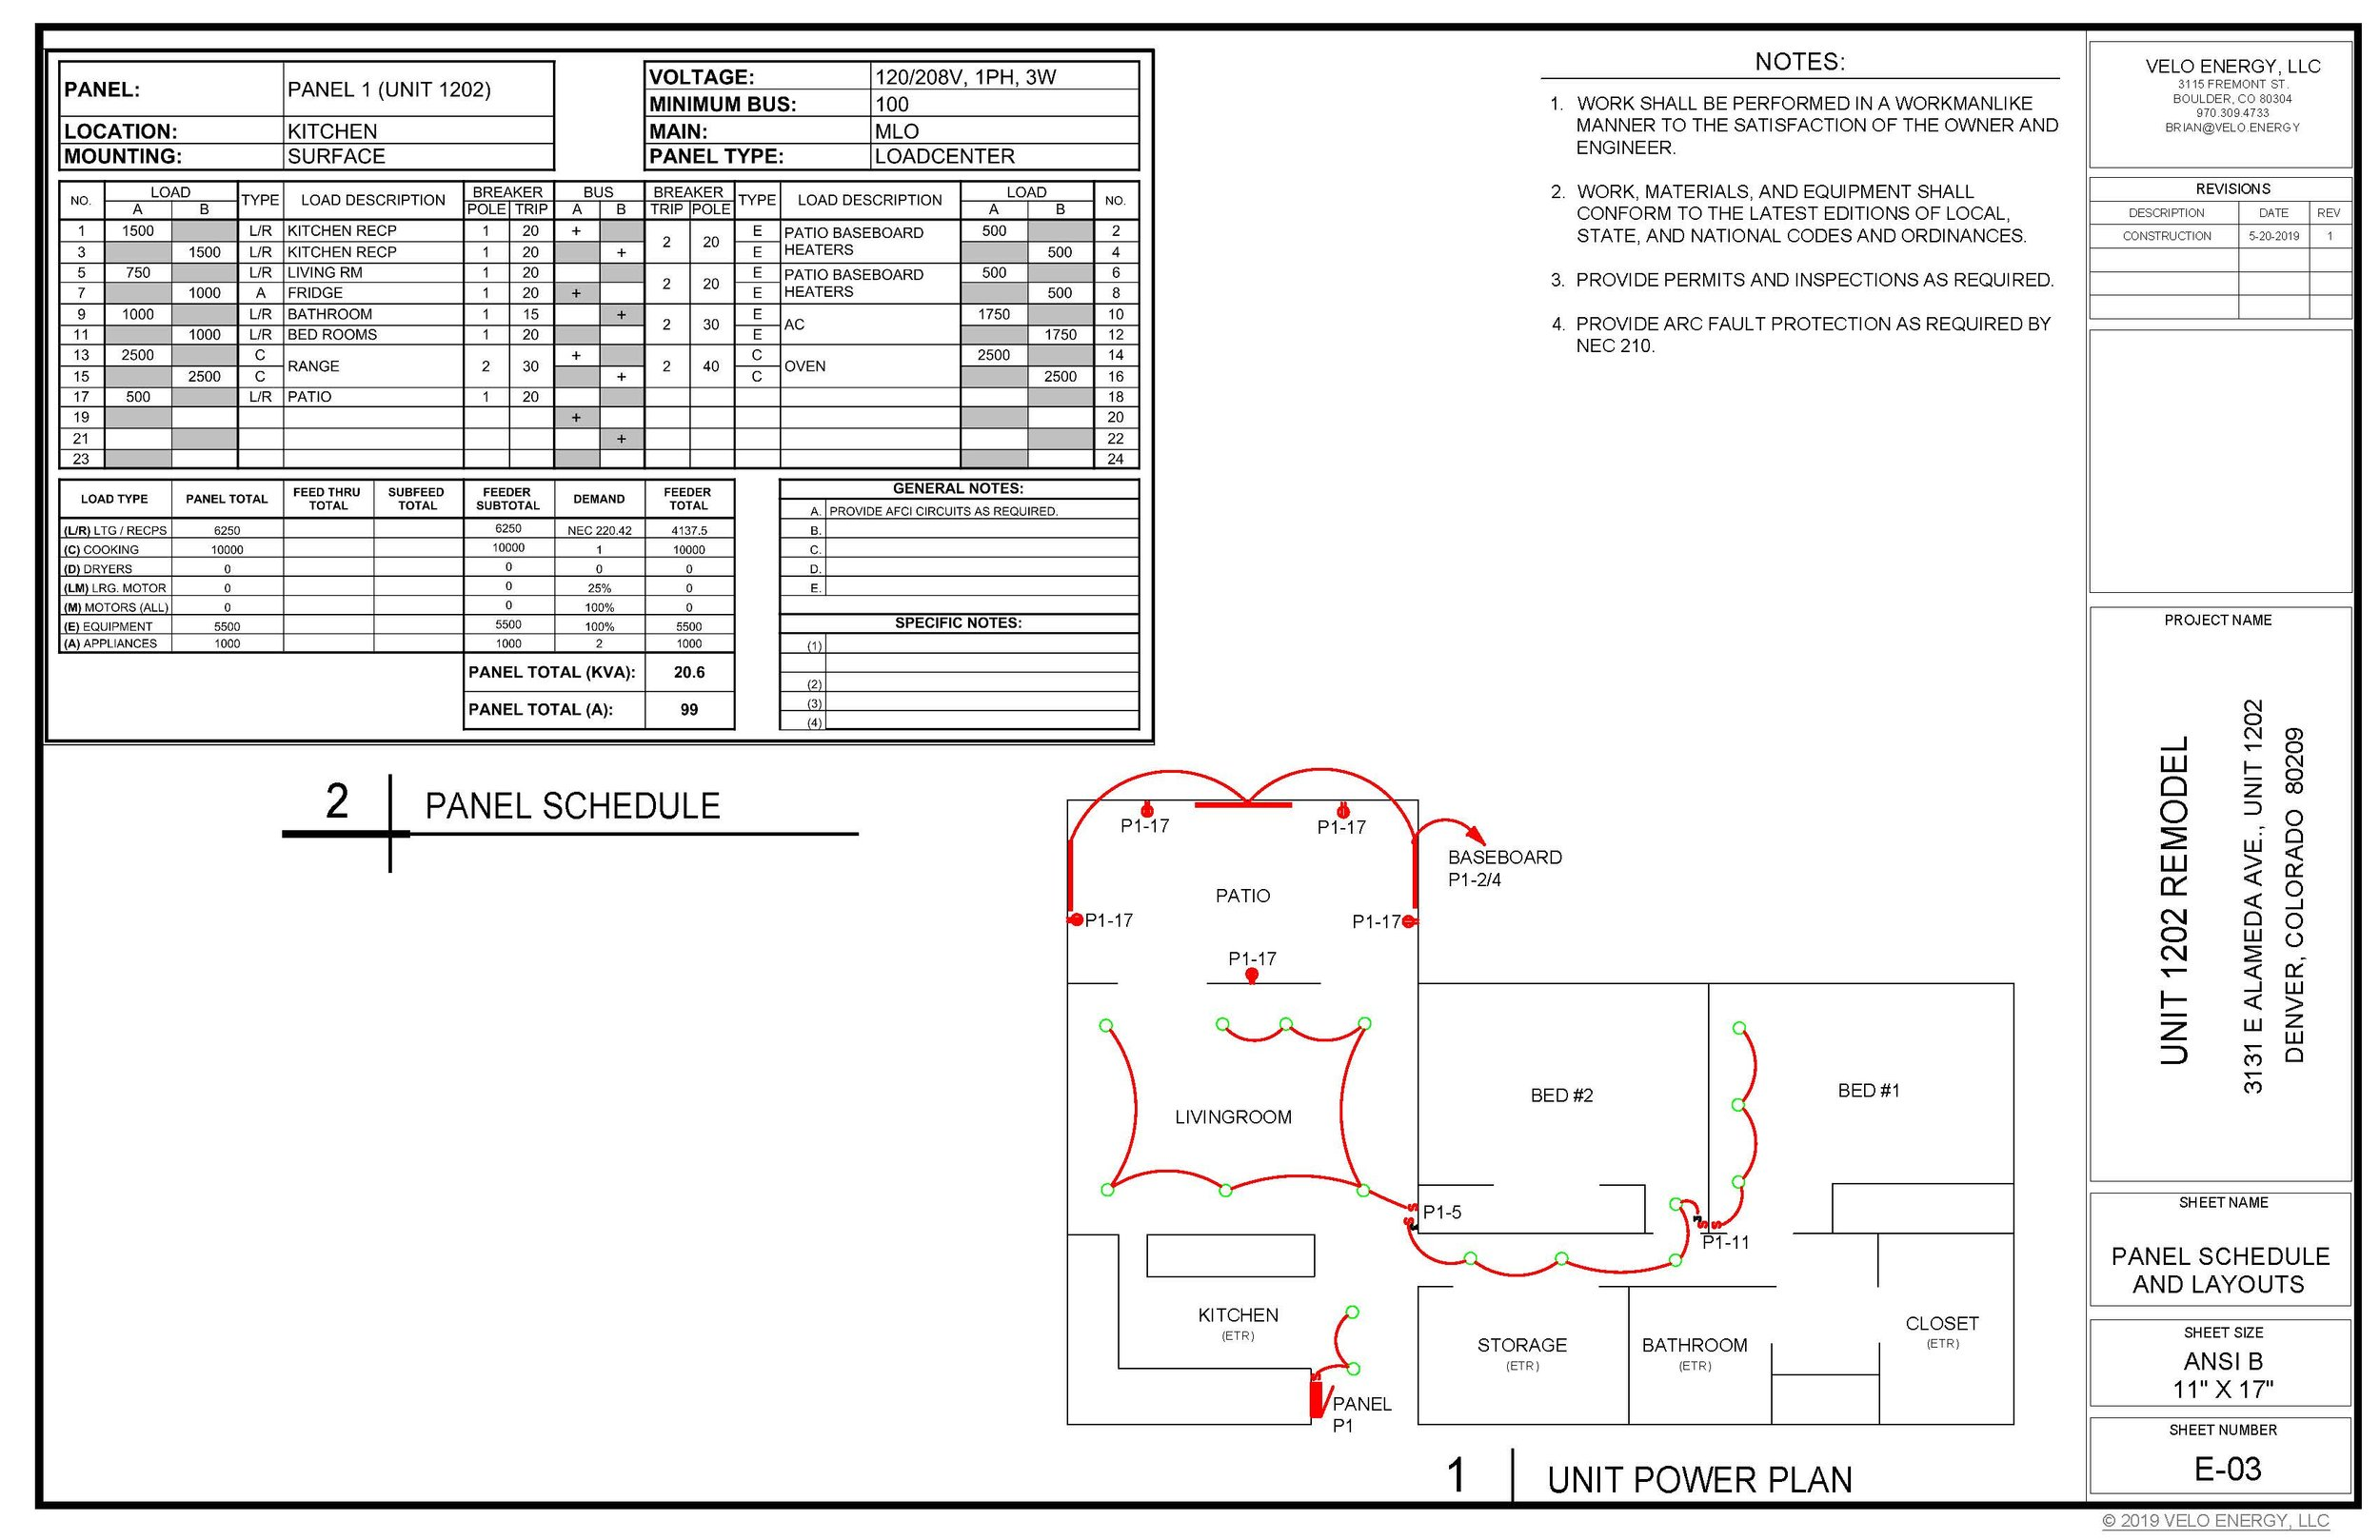 Unit 1202 Remodel_Page_3.jpg